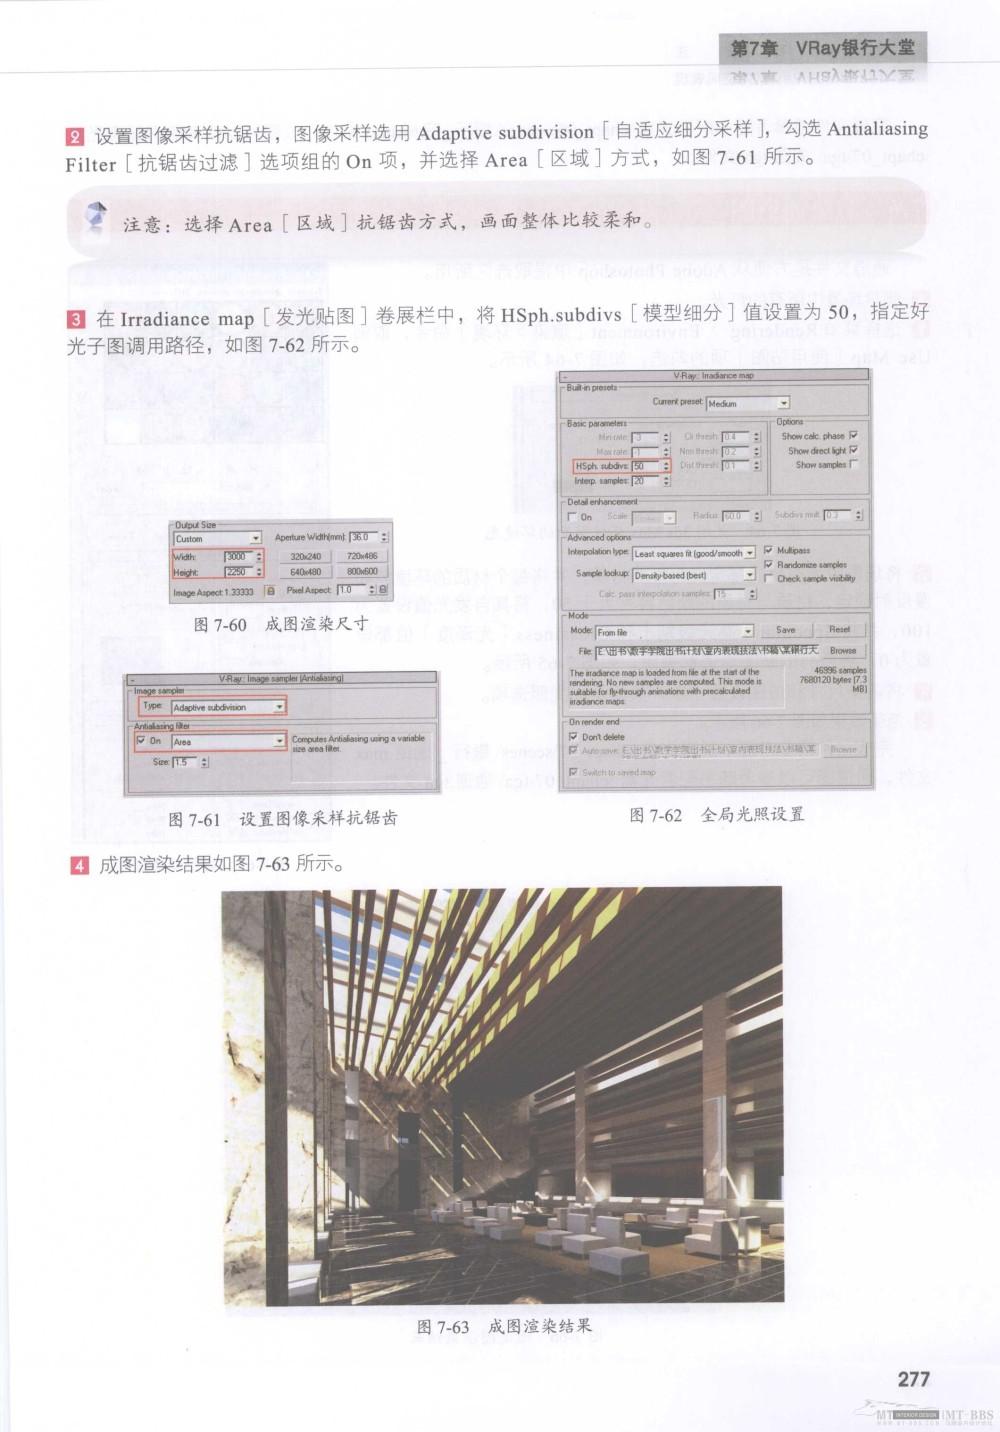 水晶石技法-3ds_Max&VRay室内空间表现_水晶石技法-3ds_Max&VRay室内空间表现_页面_283.jpg